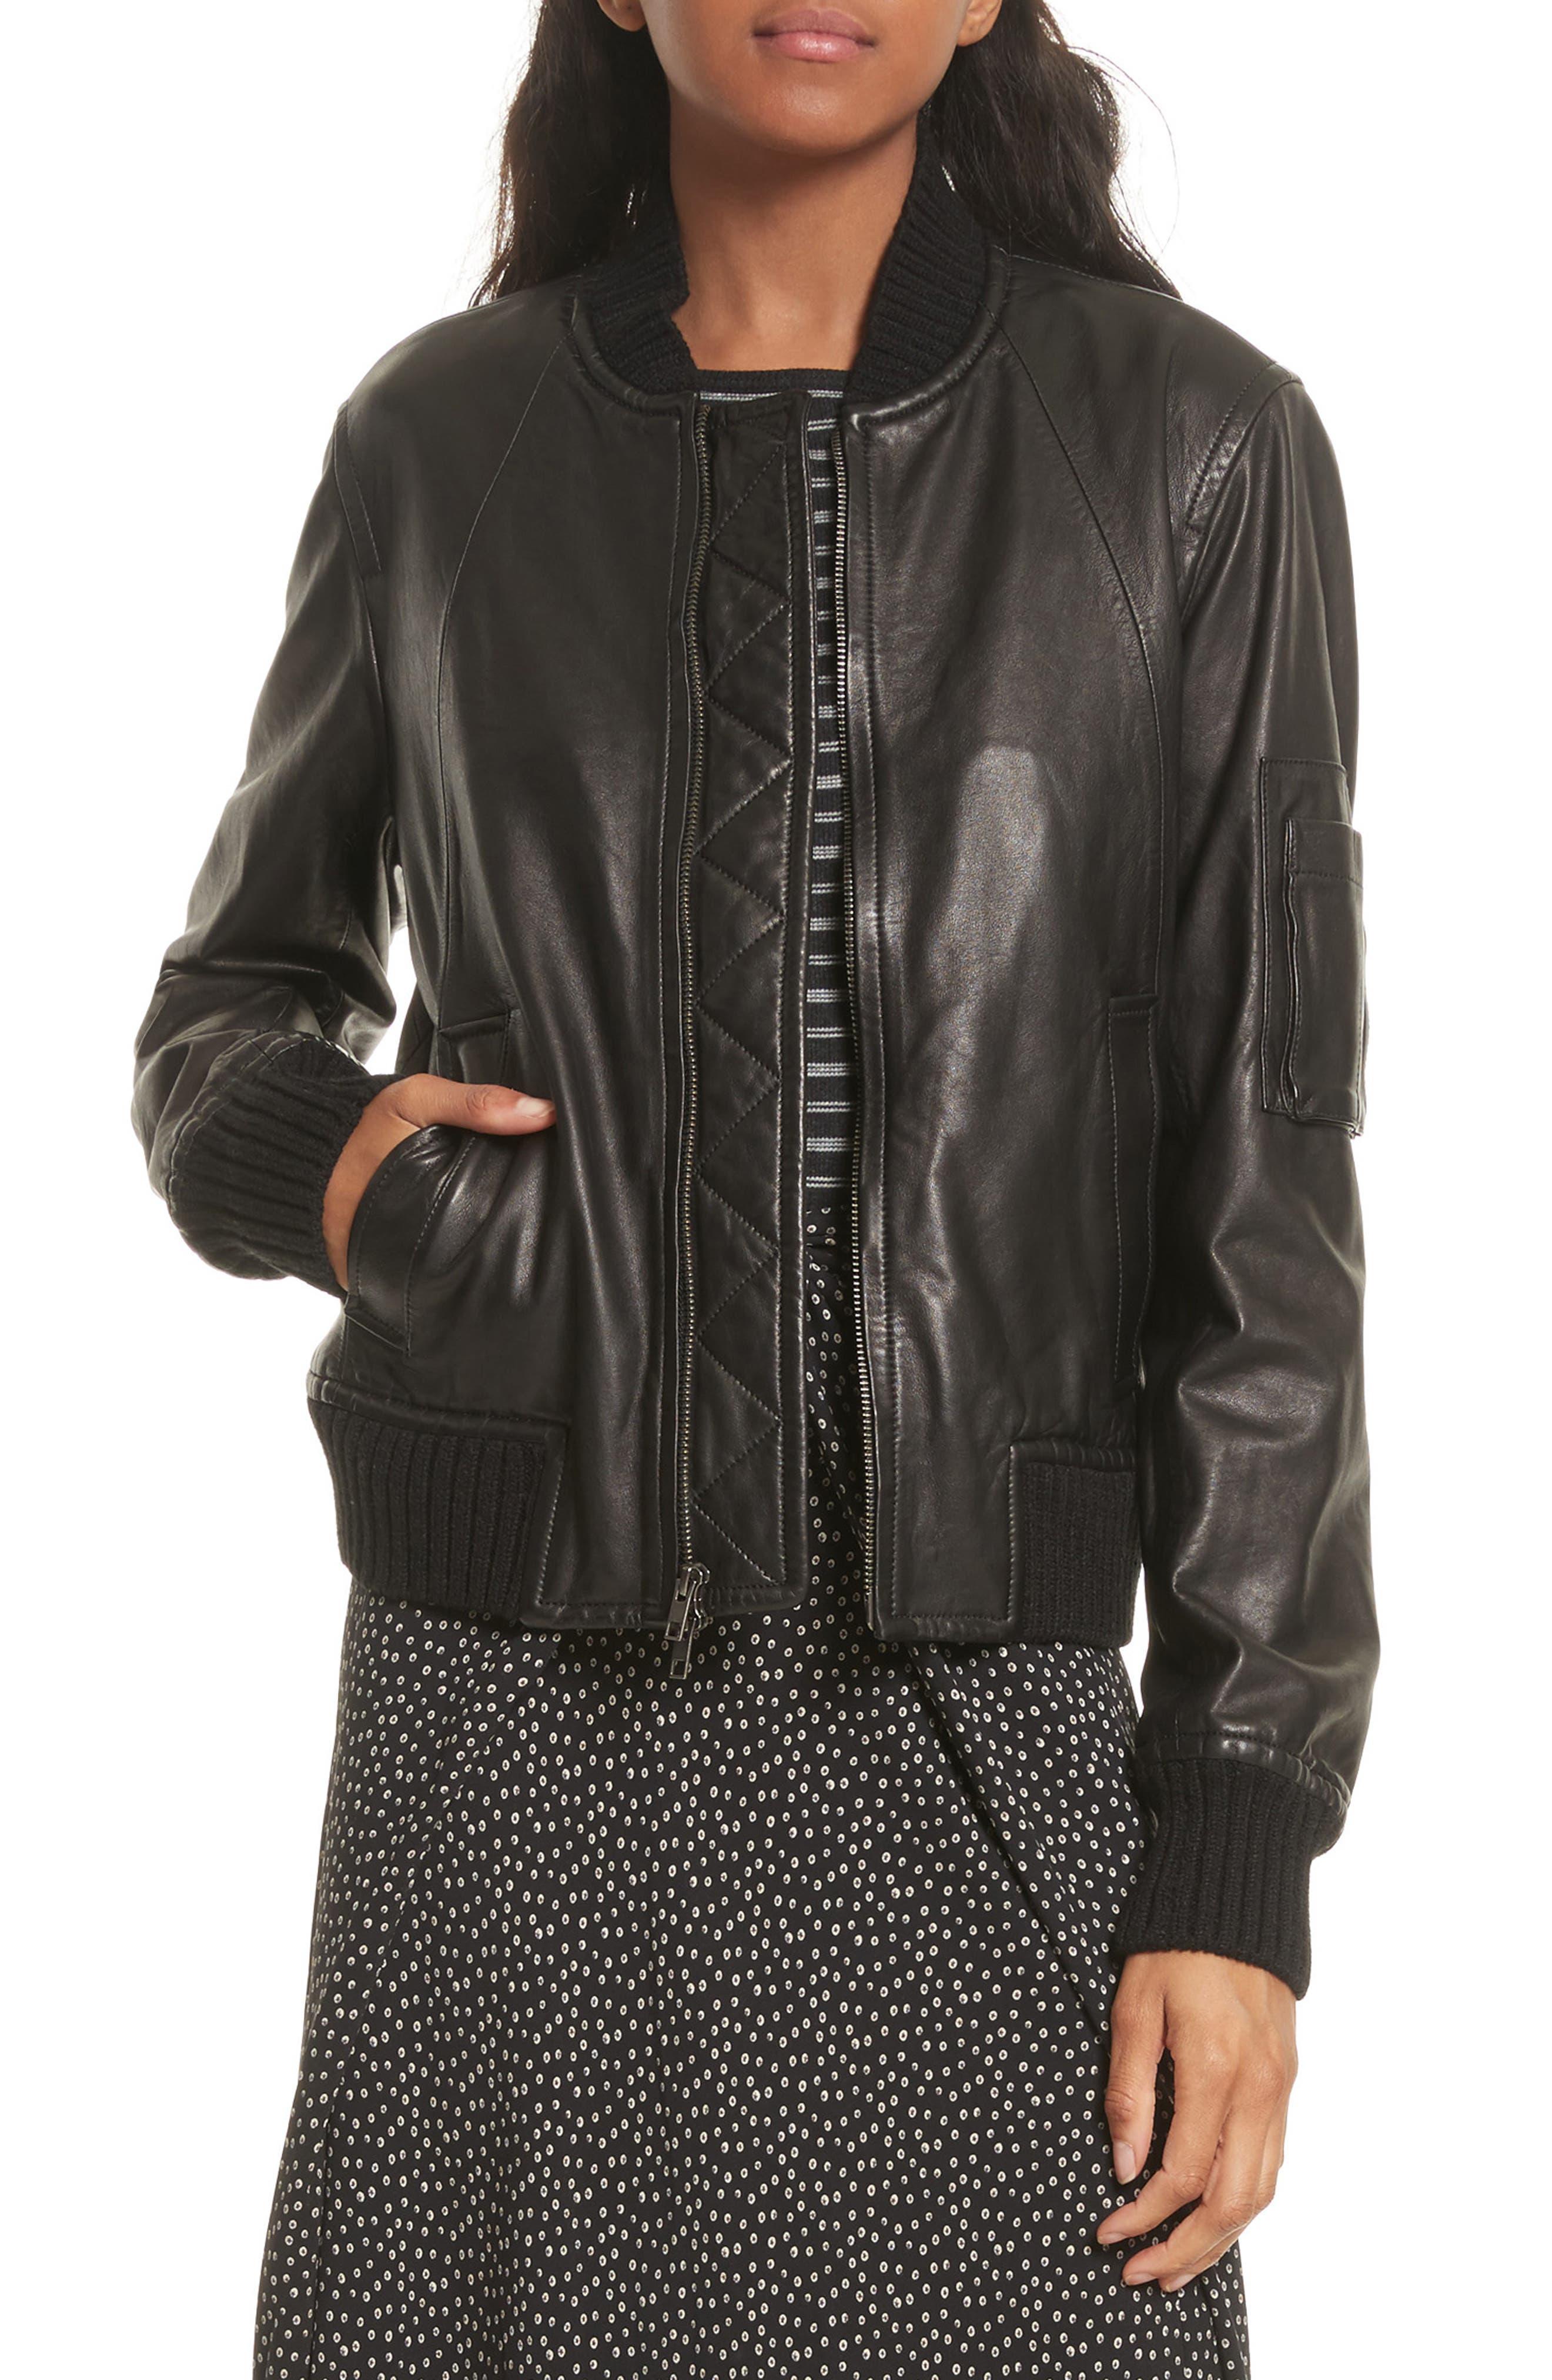 Alternate Image 1 Selected - Vince Leather Bomber Jacket